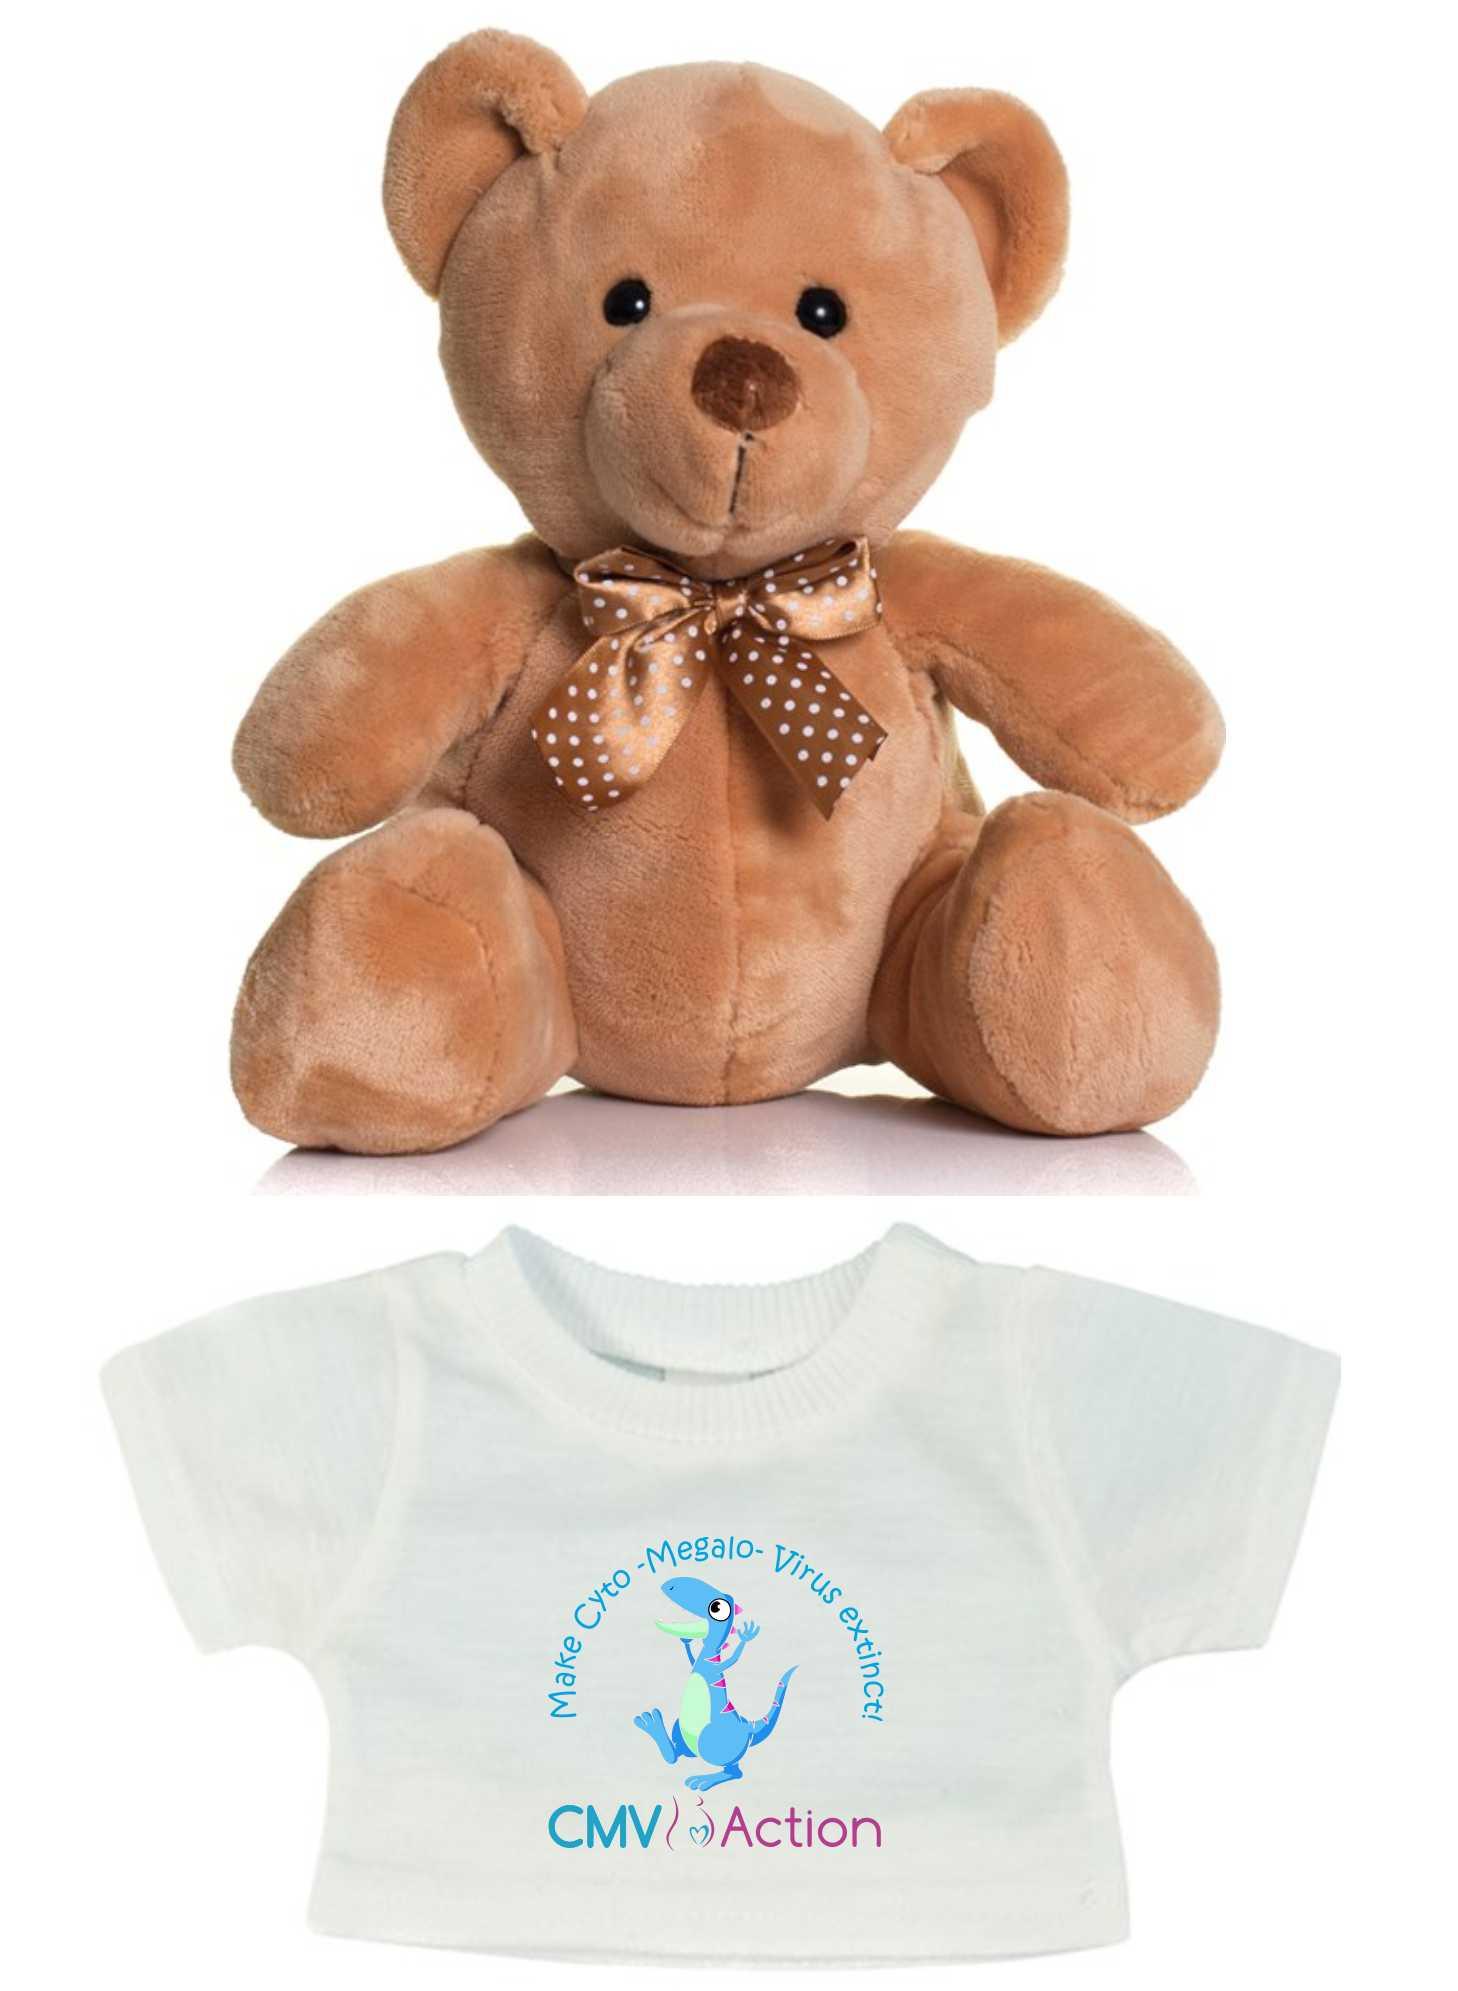 CMV- Teddy & T-shirt with Blue Dinosaur Print